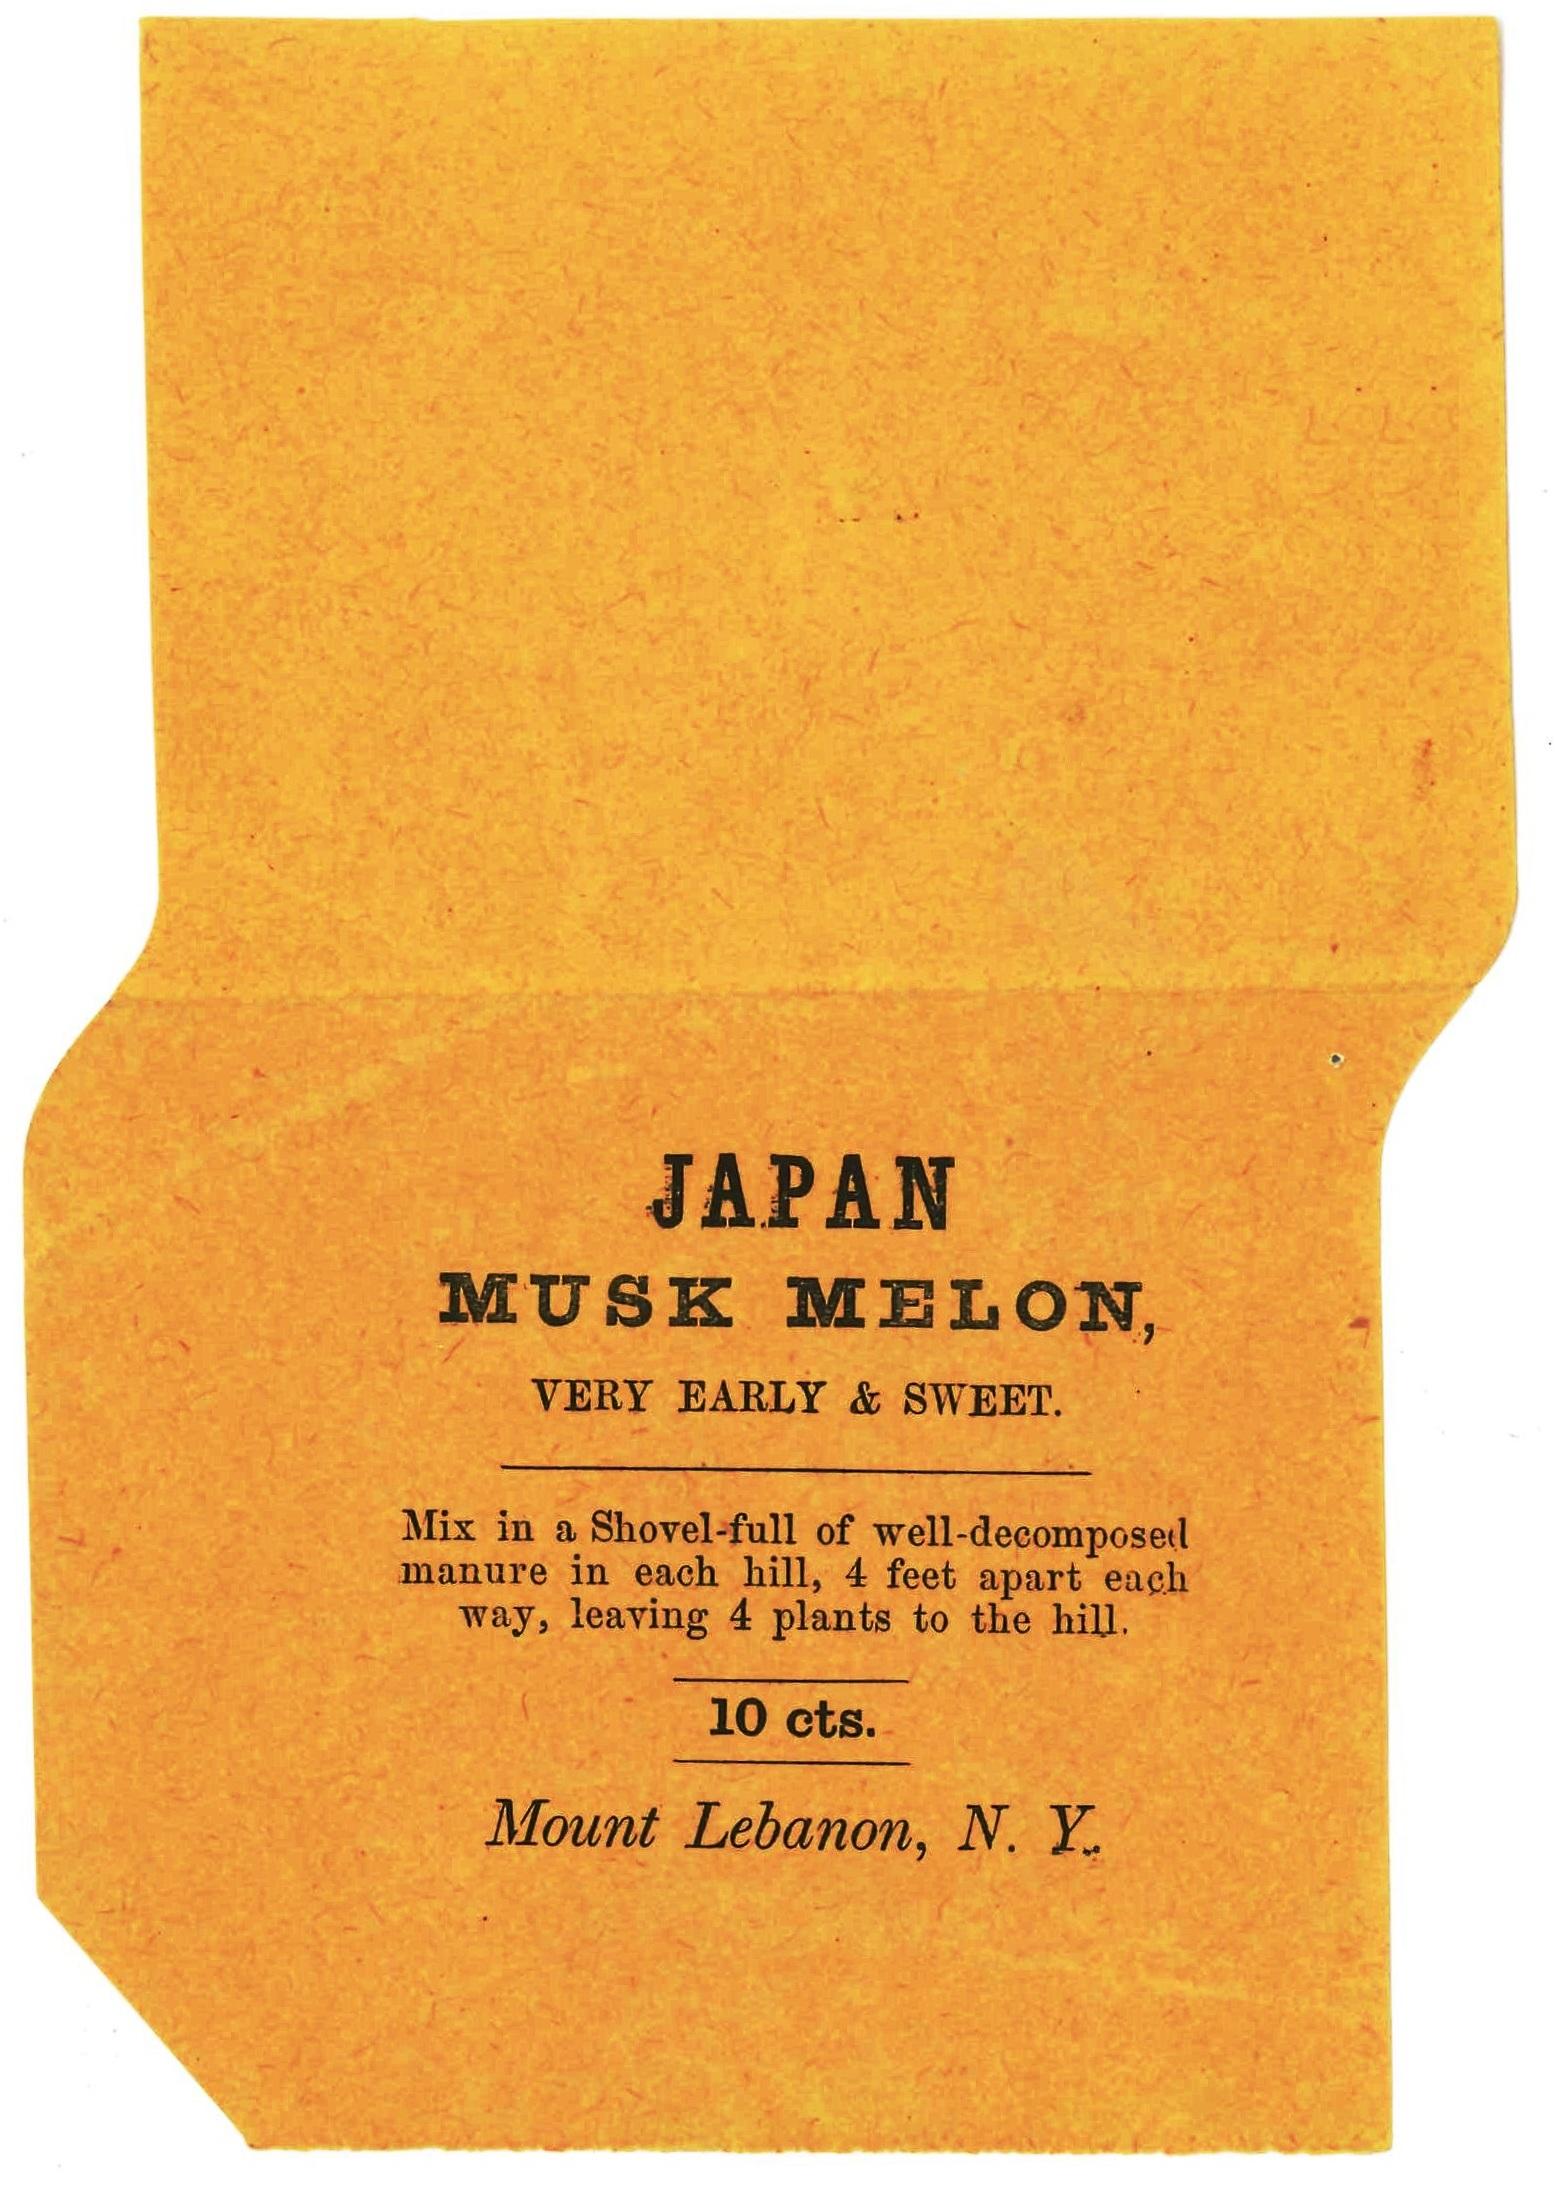 Japan Musk Melon Seed Bag, Mount Lebanon, NY, Ca. 1860s